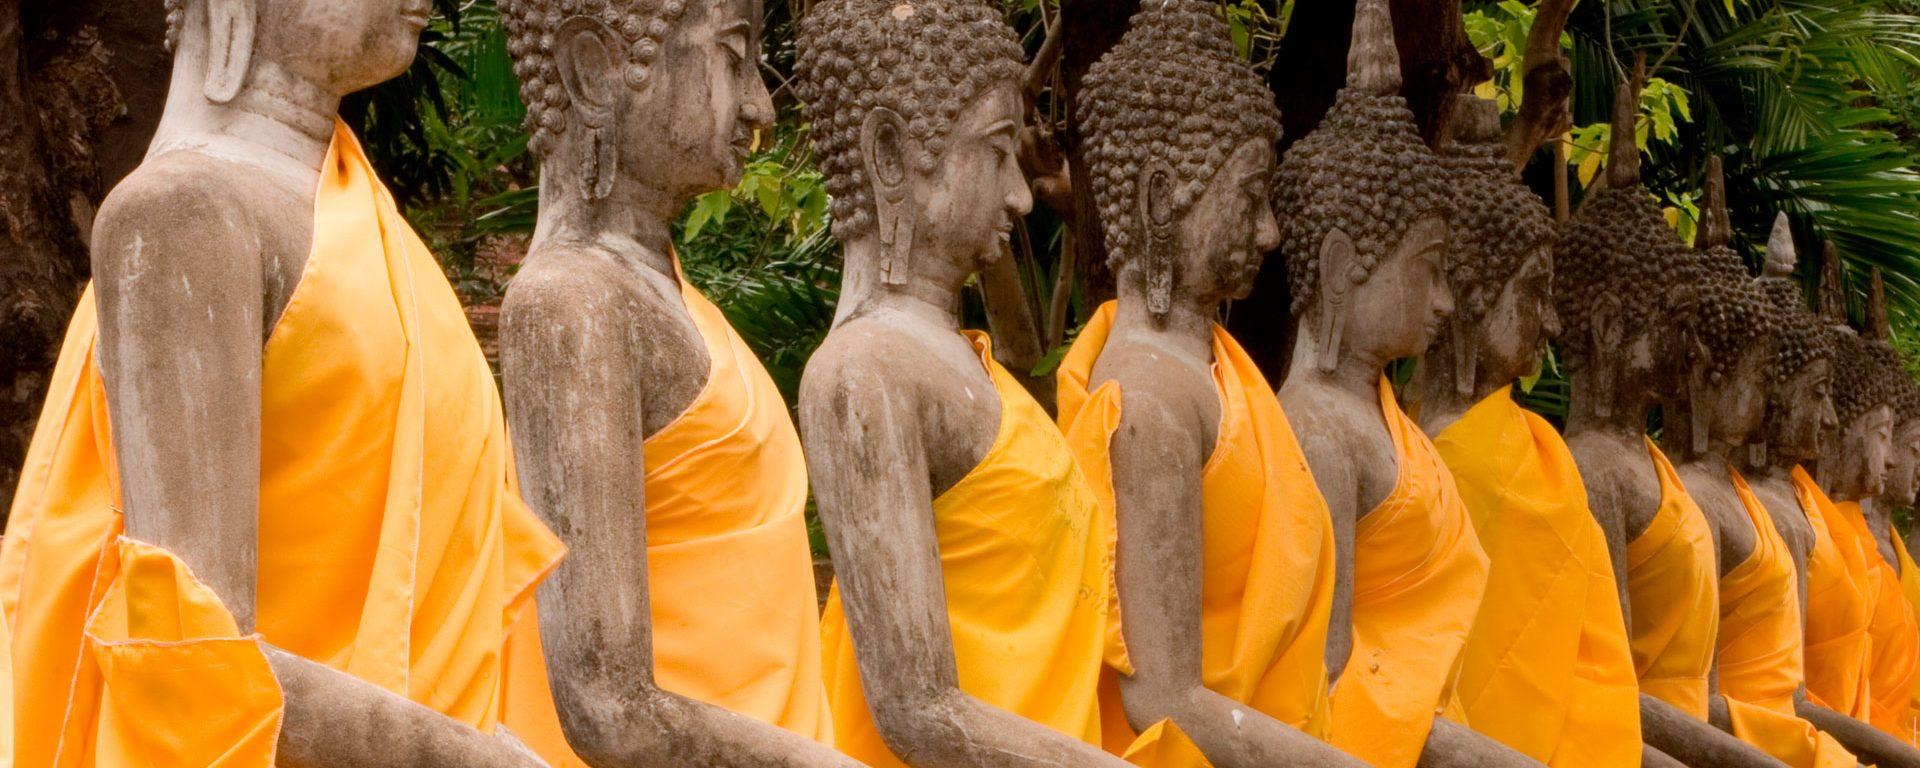 Buddhas at the site of Ayutthaya, Thailand